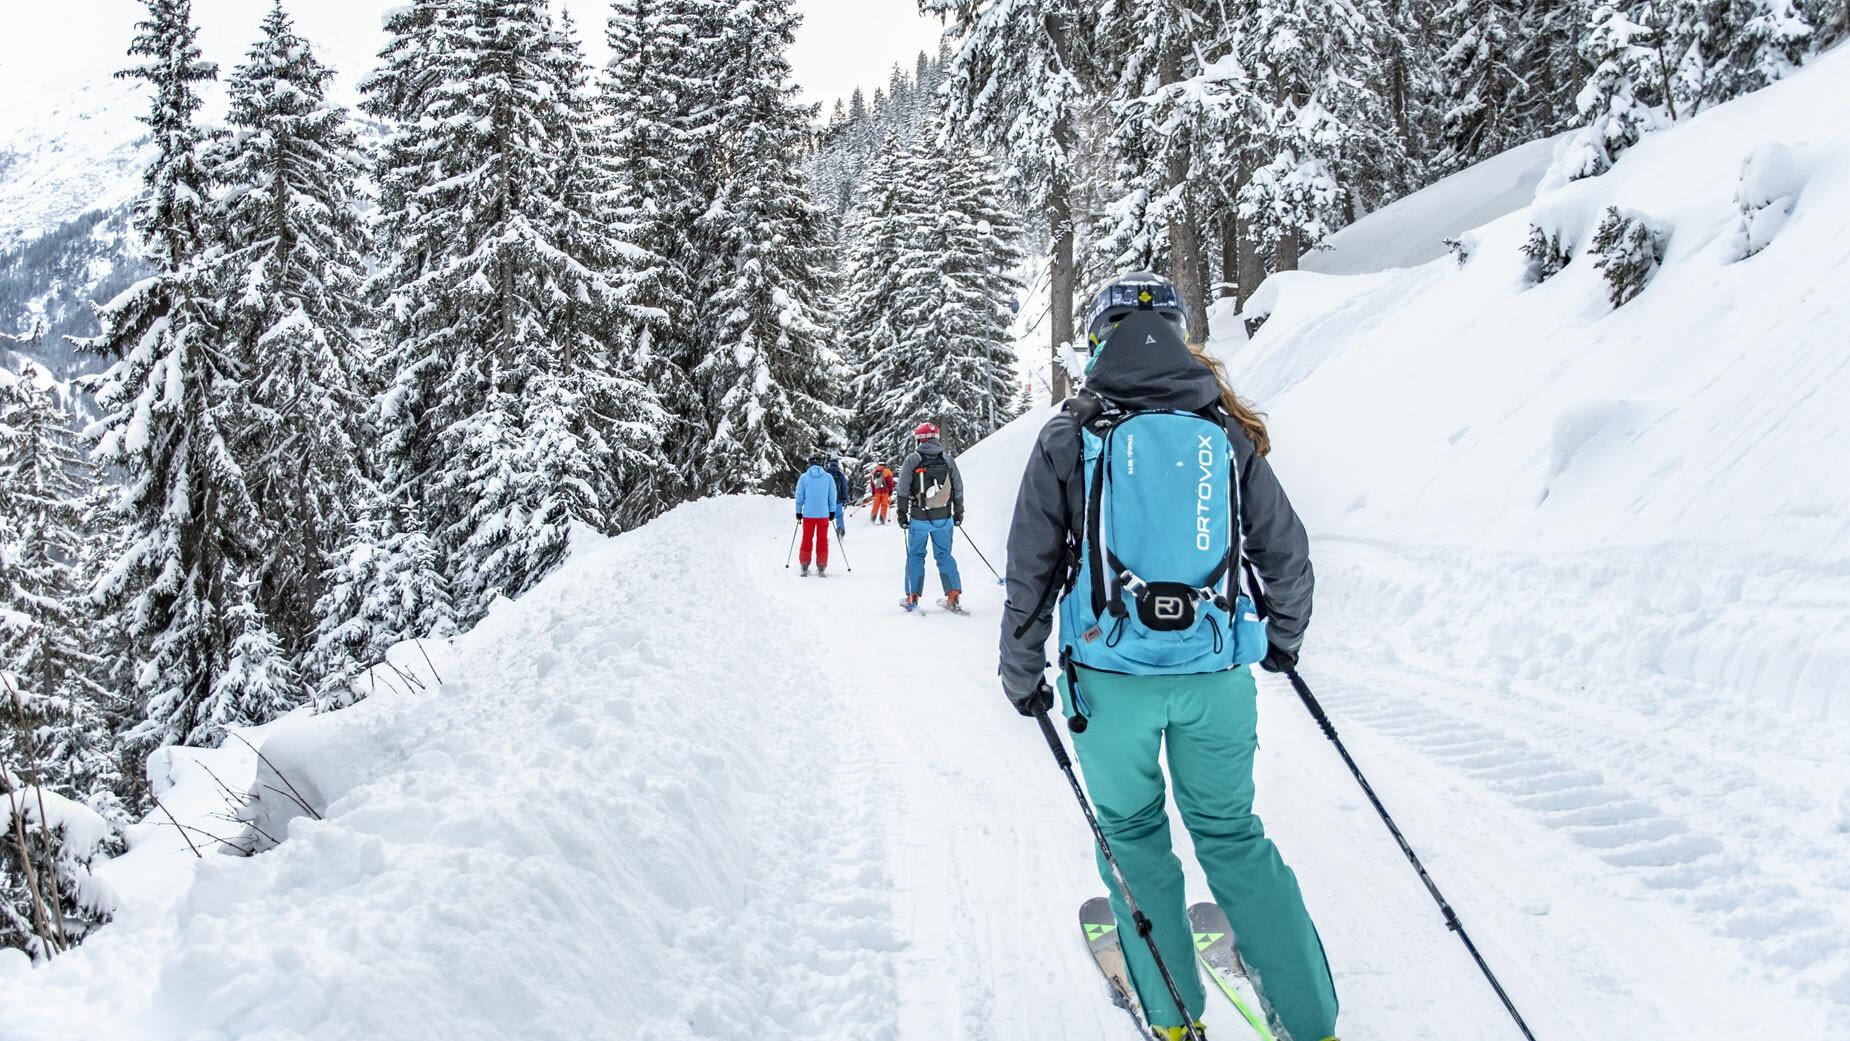 Skifahrer in St. Anton am Arlberg